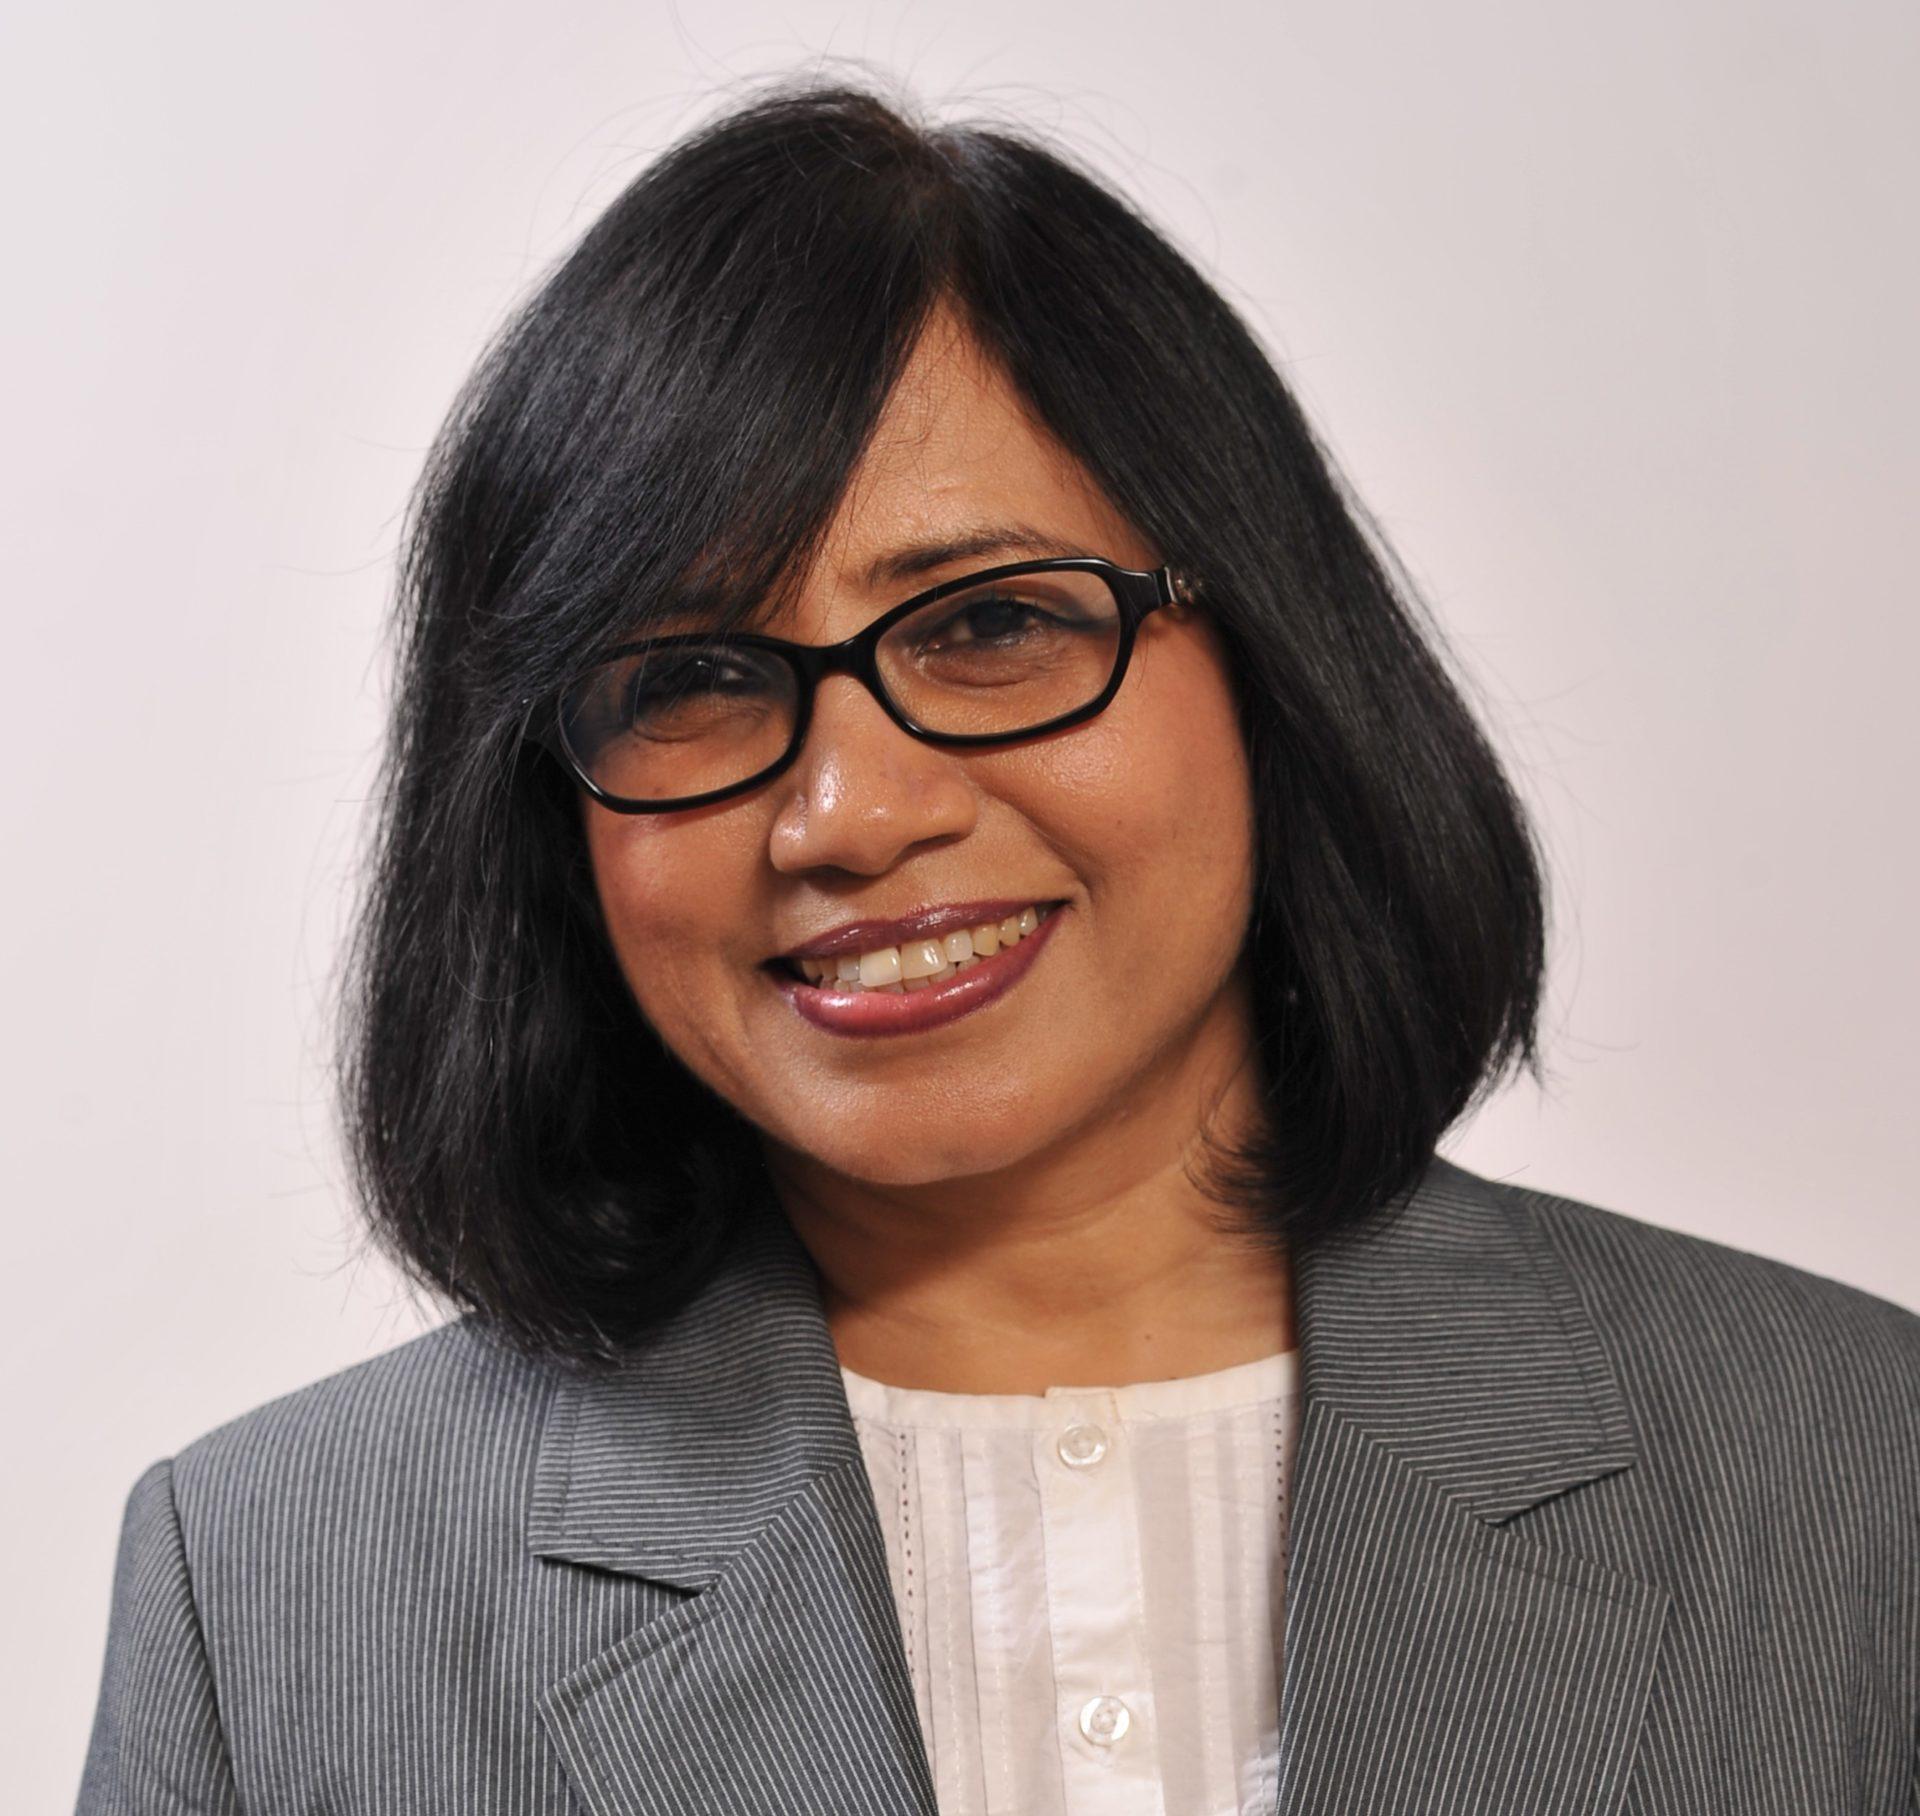 Ritu Rohatgi-coach 5 Exploring the Leadership